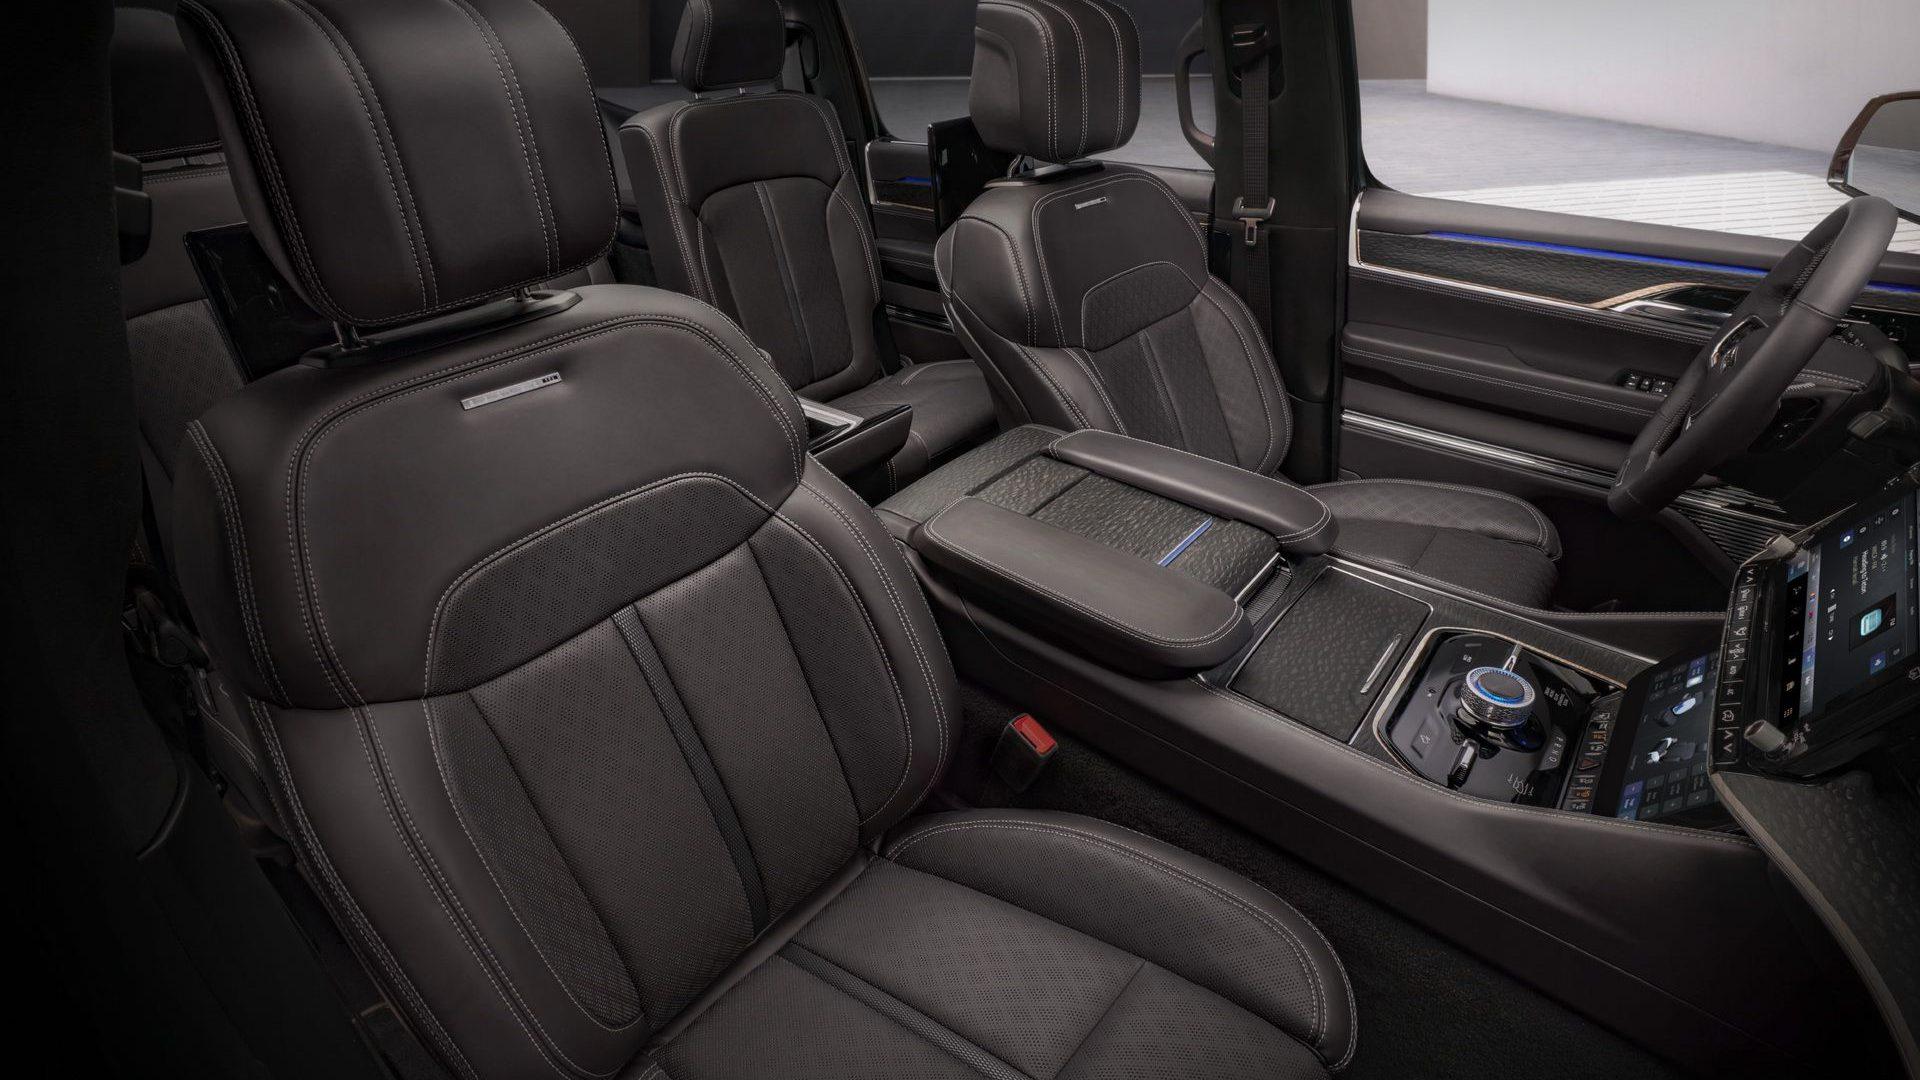 2020-Jeep-Grand-Wagoneer-Concept-Interior-04